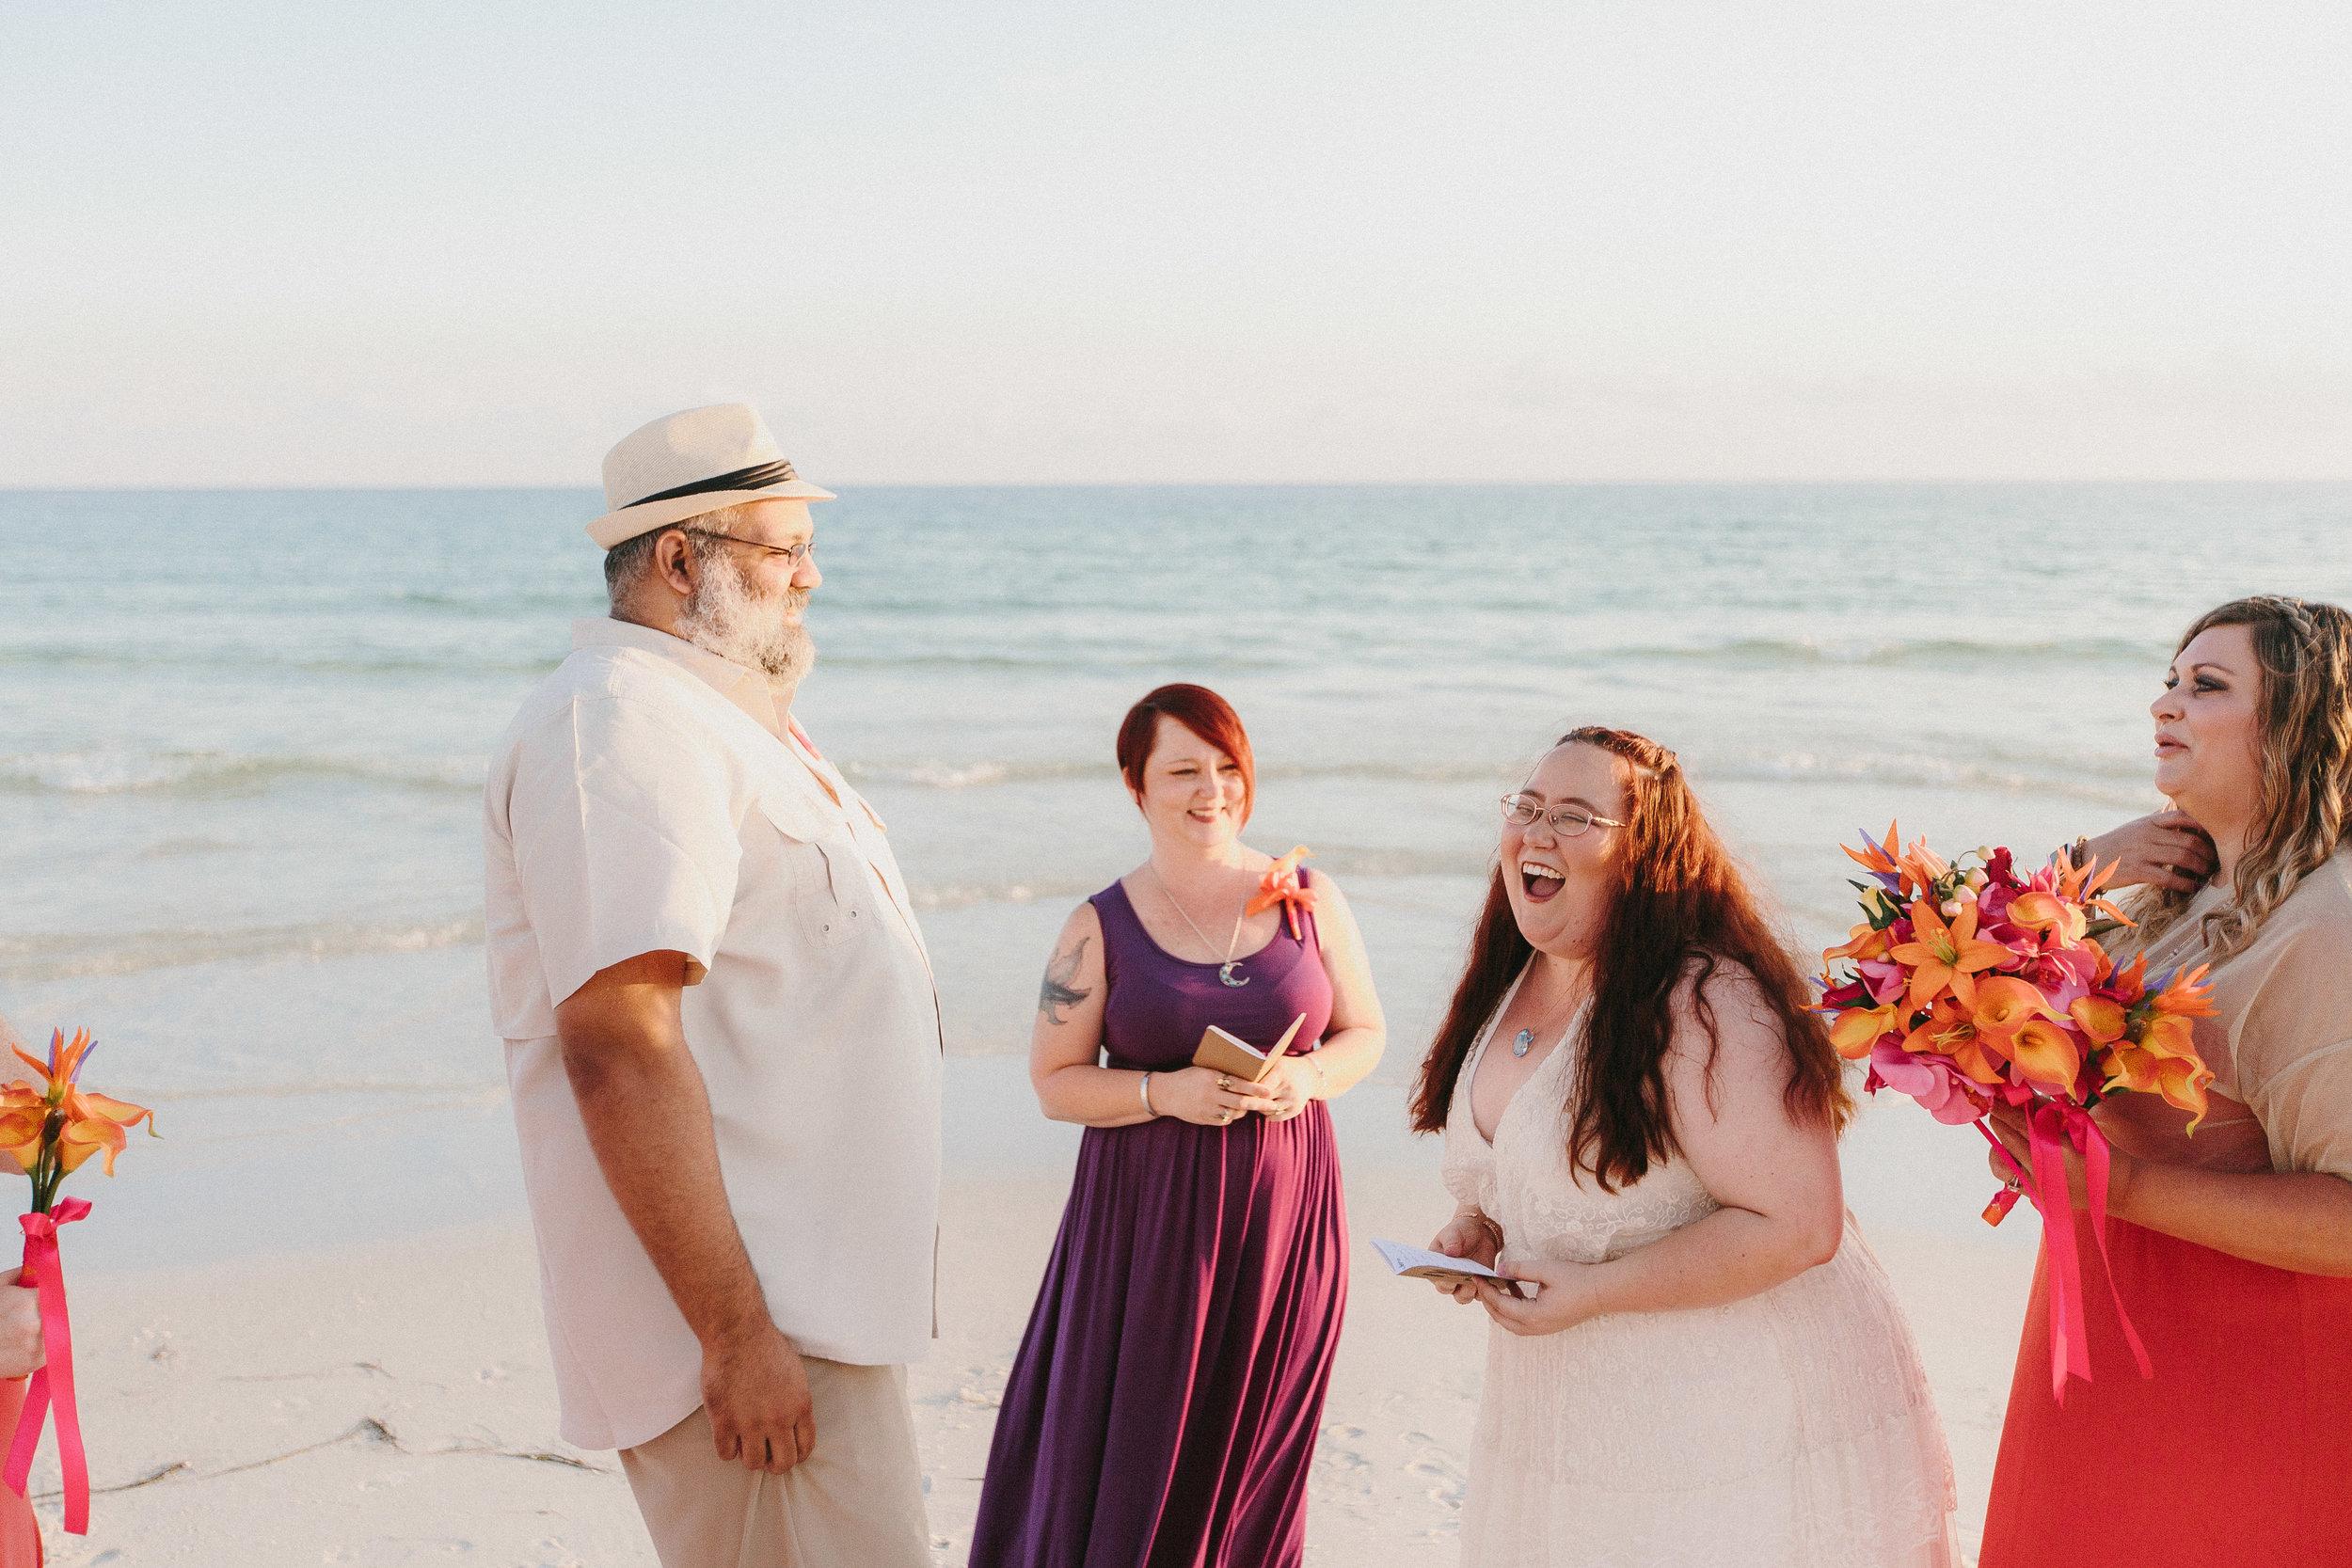 destin_sunset_beach_elopement_intimate_wedding_photographer_florida_documentary_1193.jpg